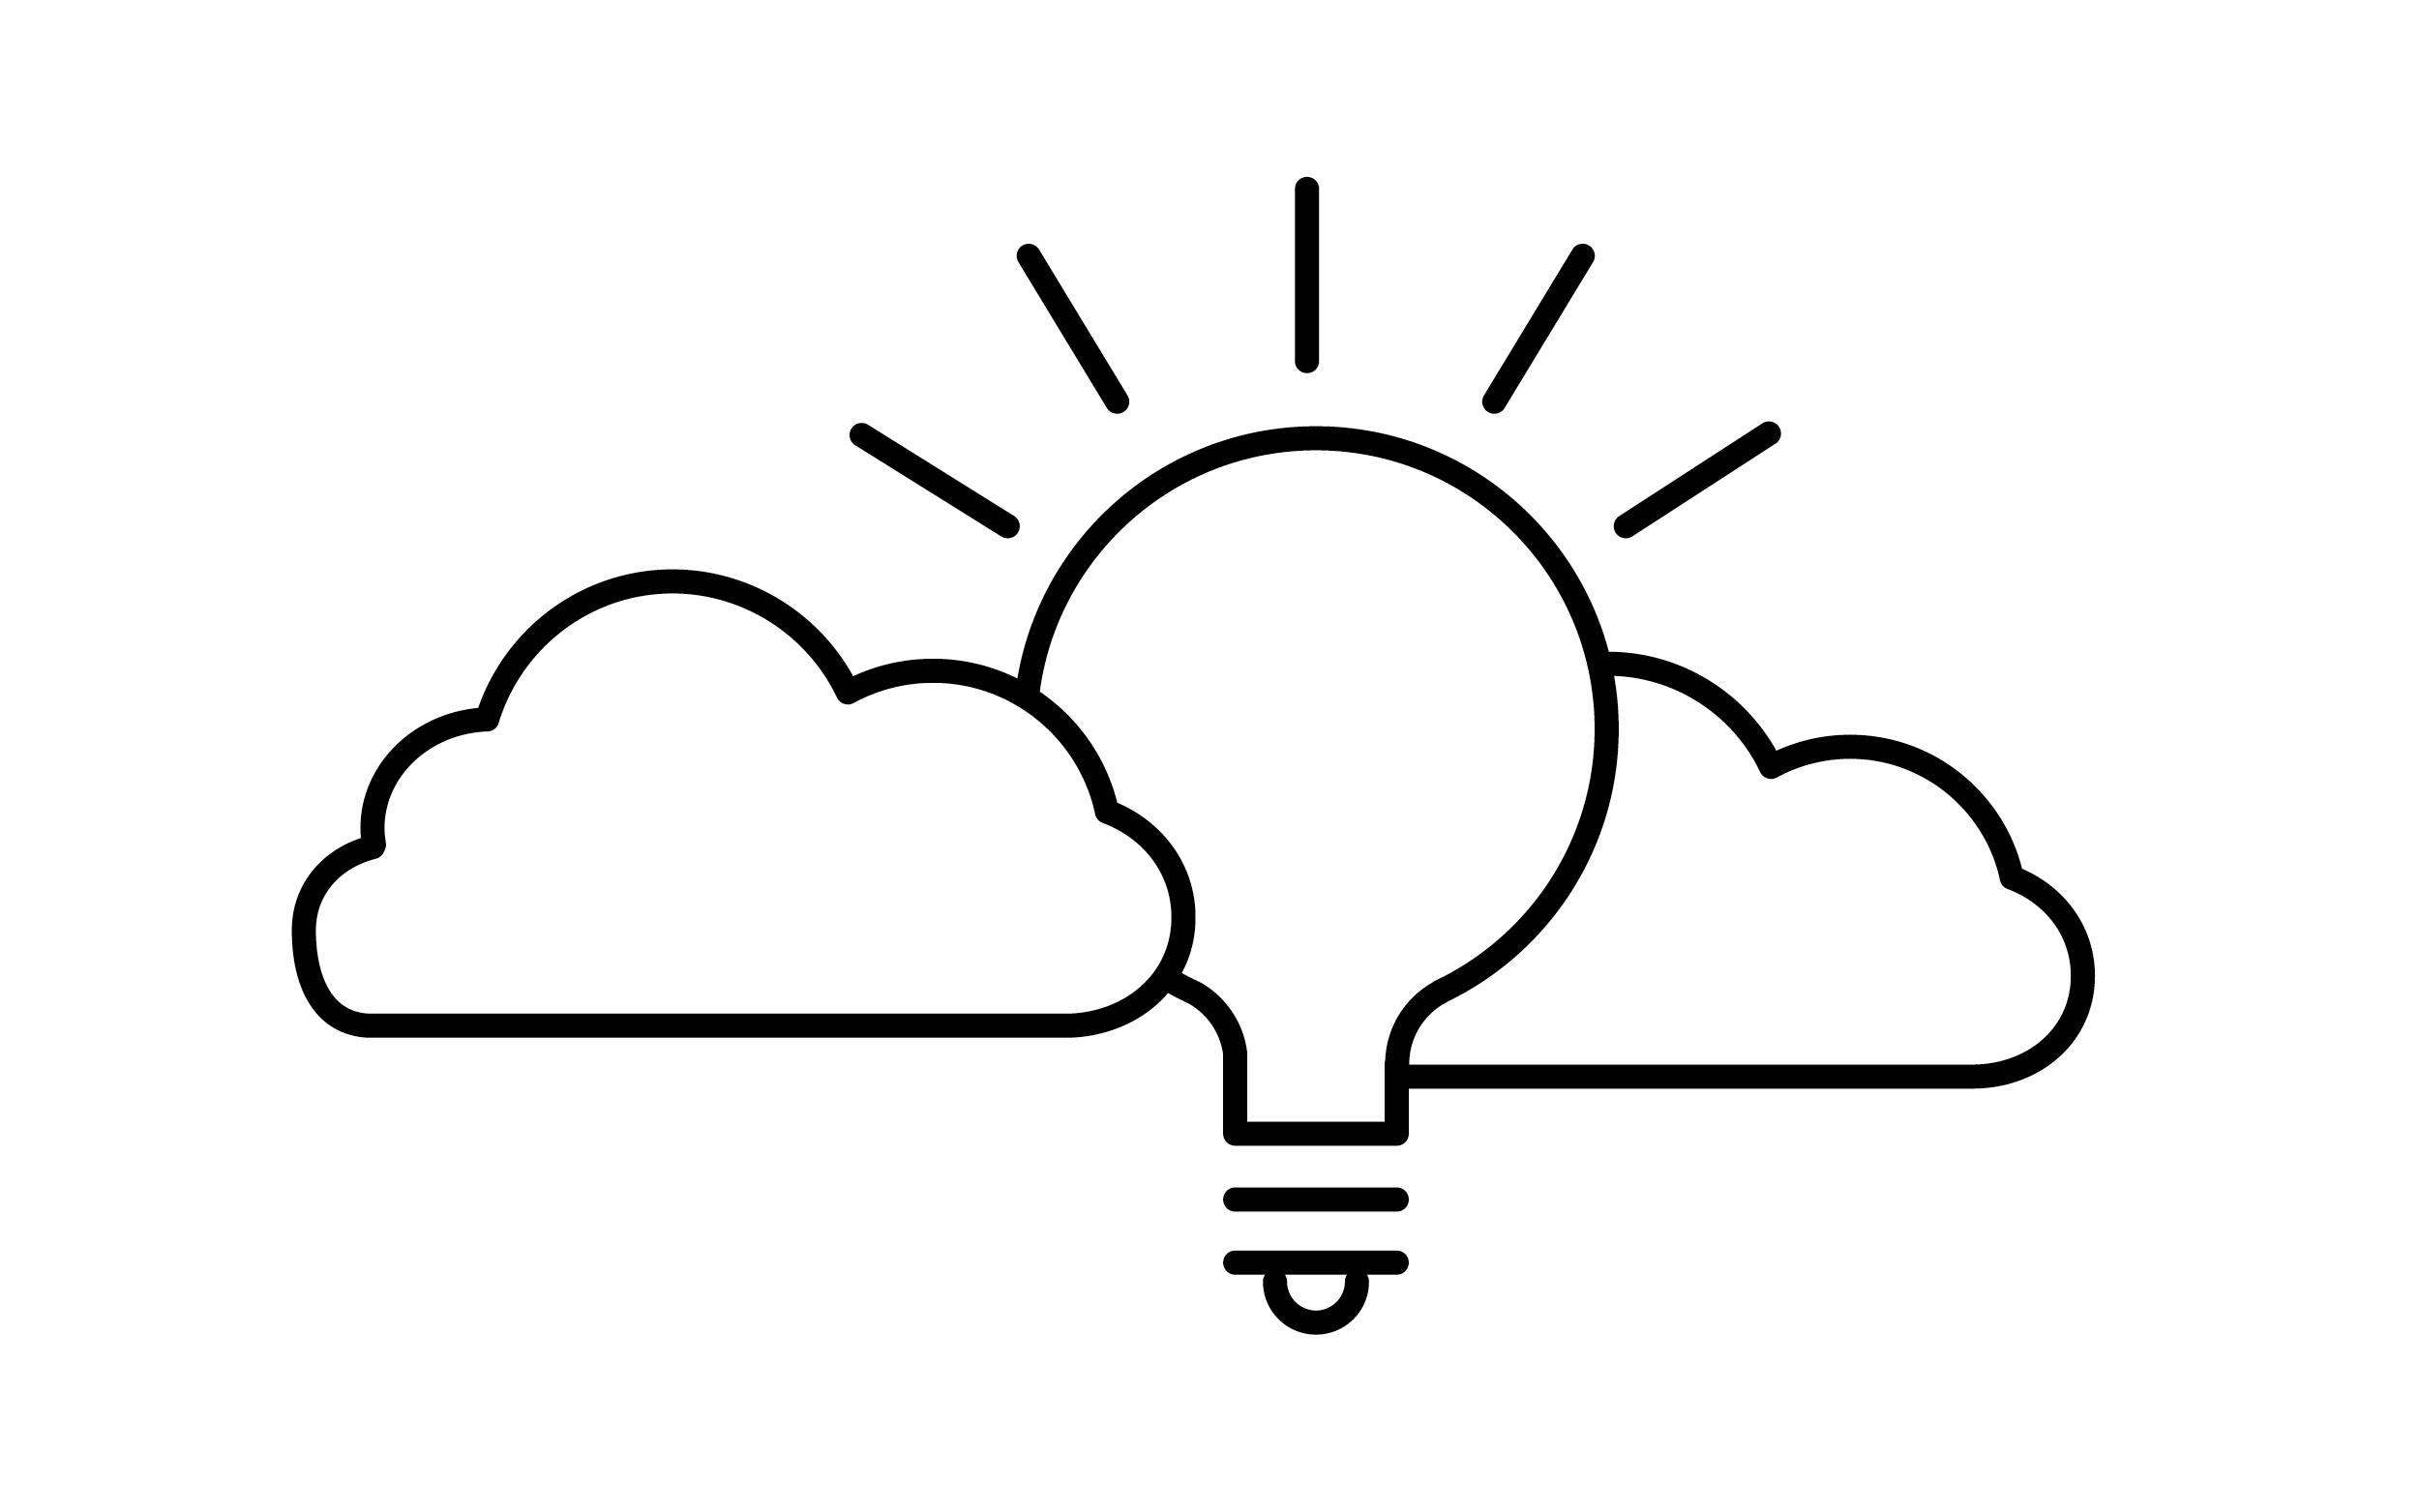 Geek Week: Free Workshops for the Designer, Techie and Entrepreneur in You